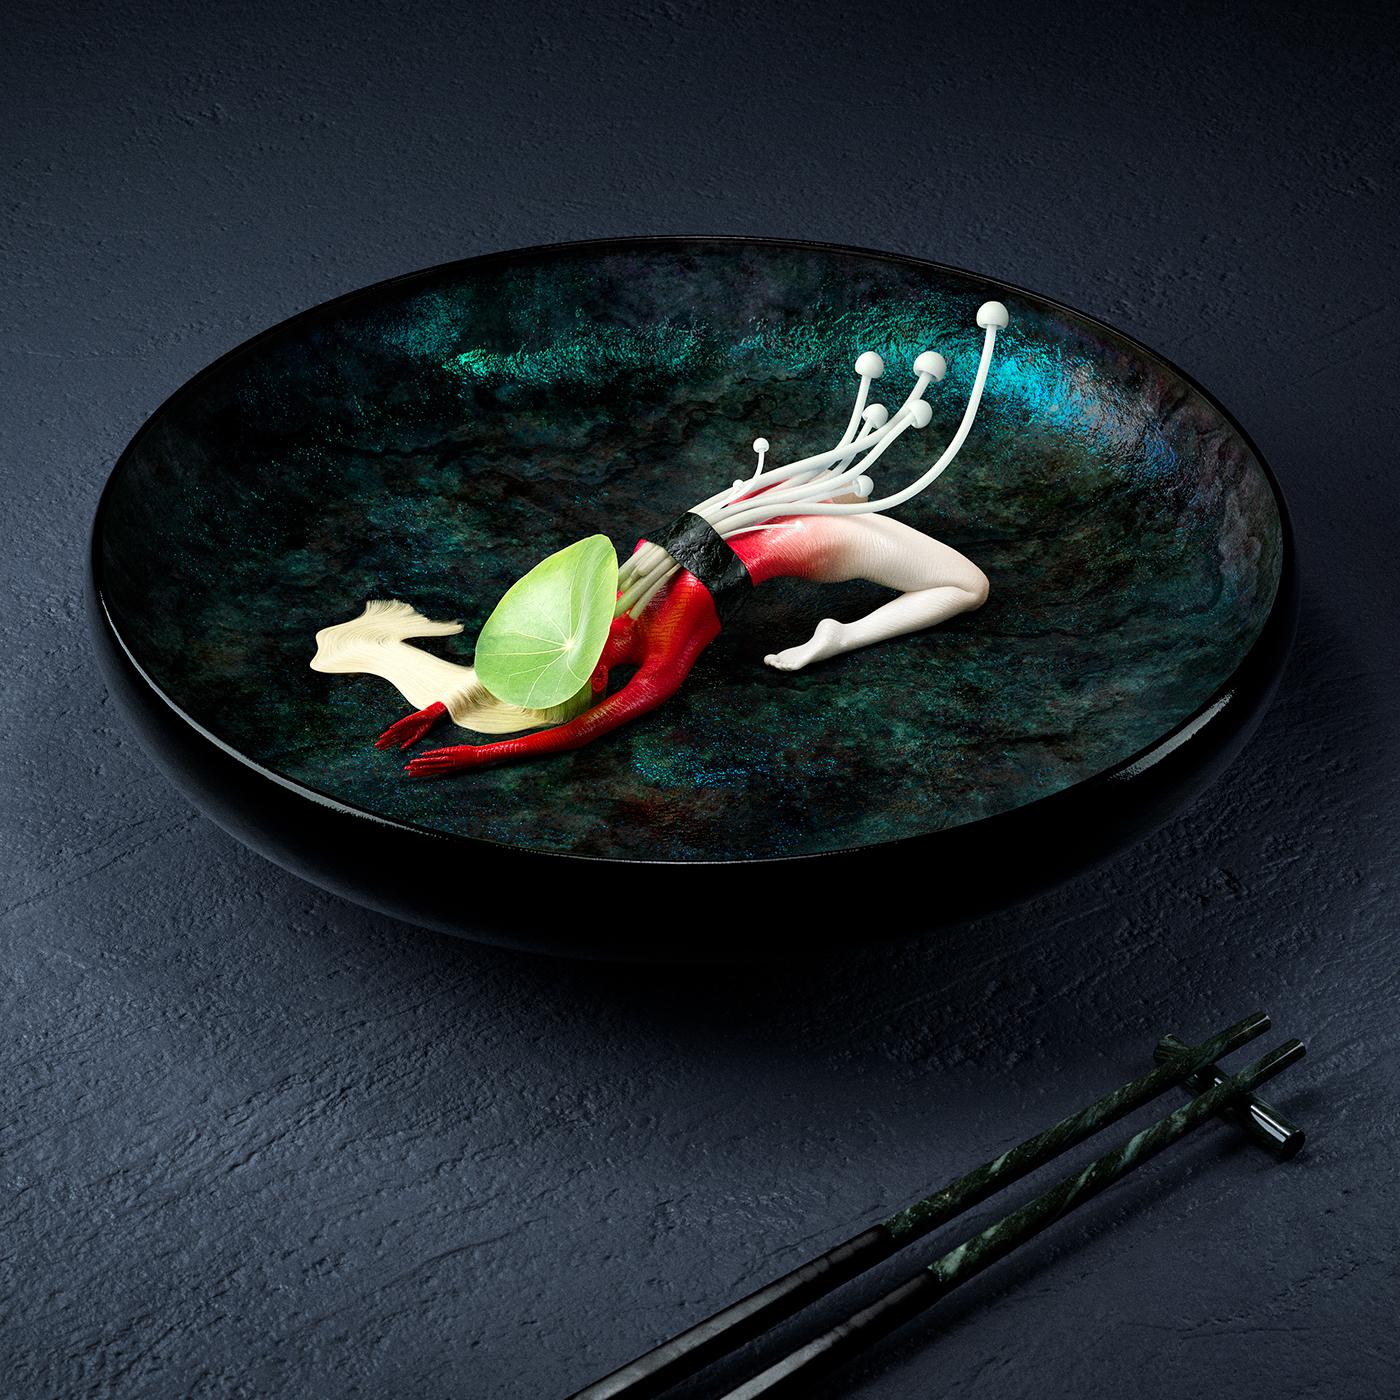 Digital Art ,women body,Sushi,gastronomy,gourmet,luxury,foodporn